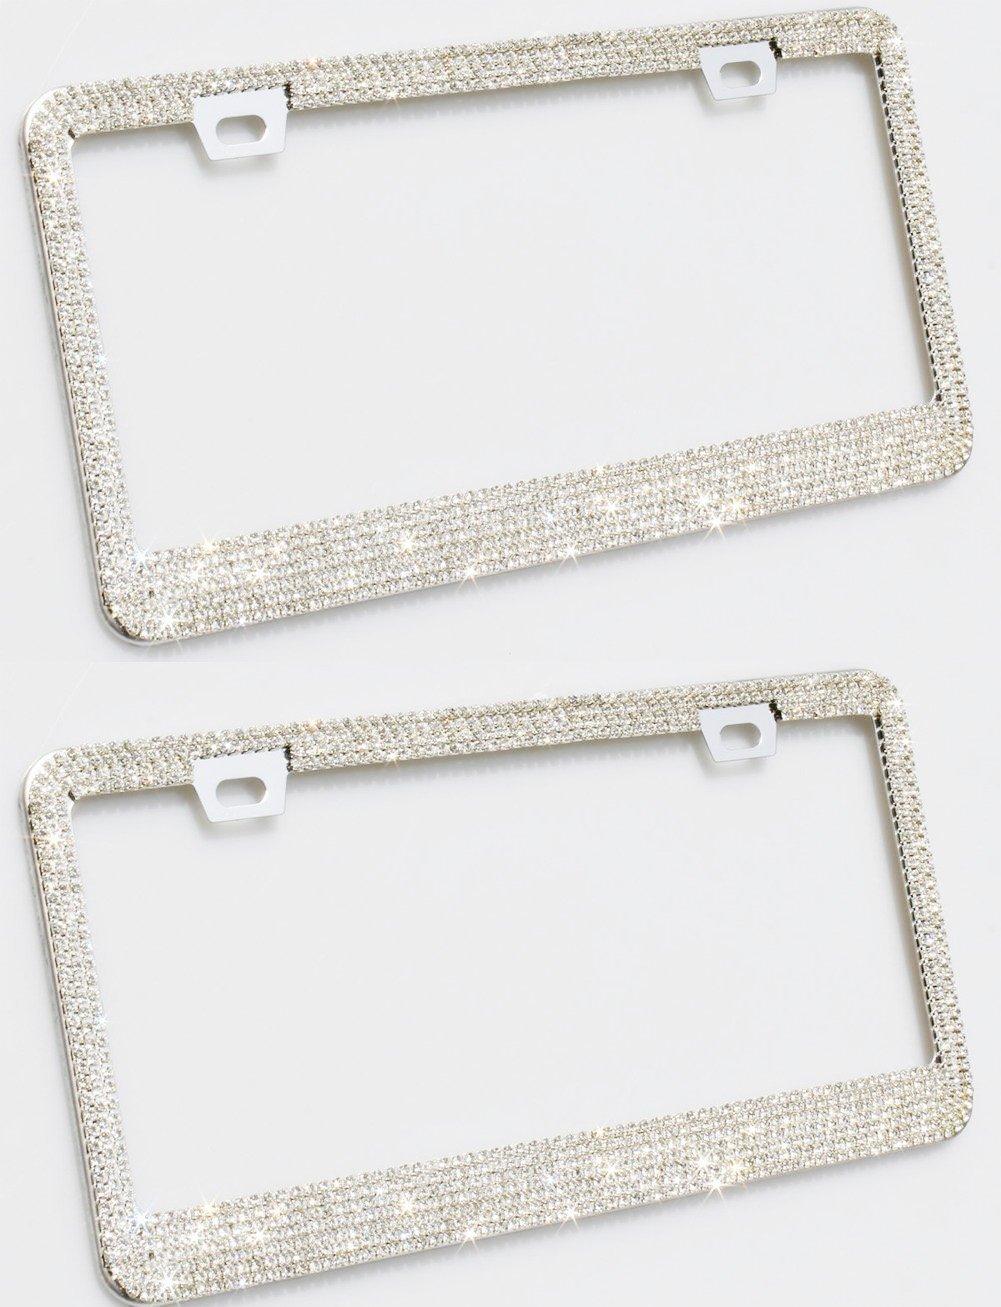 Buy TASIRO 2 PACK Pure Handmade Bling Bling Rhinestones Stainless ...